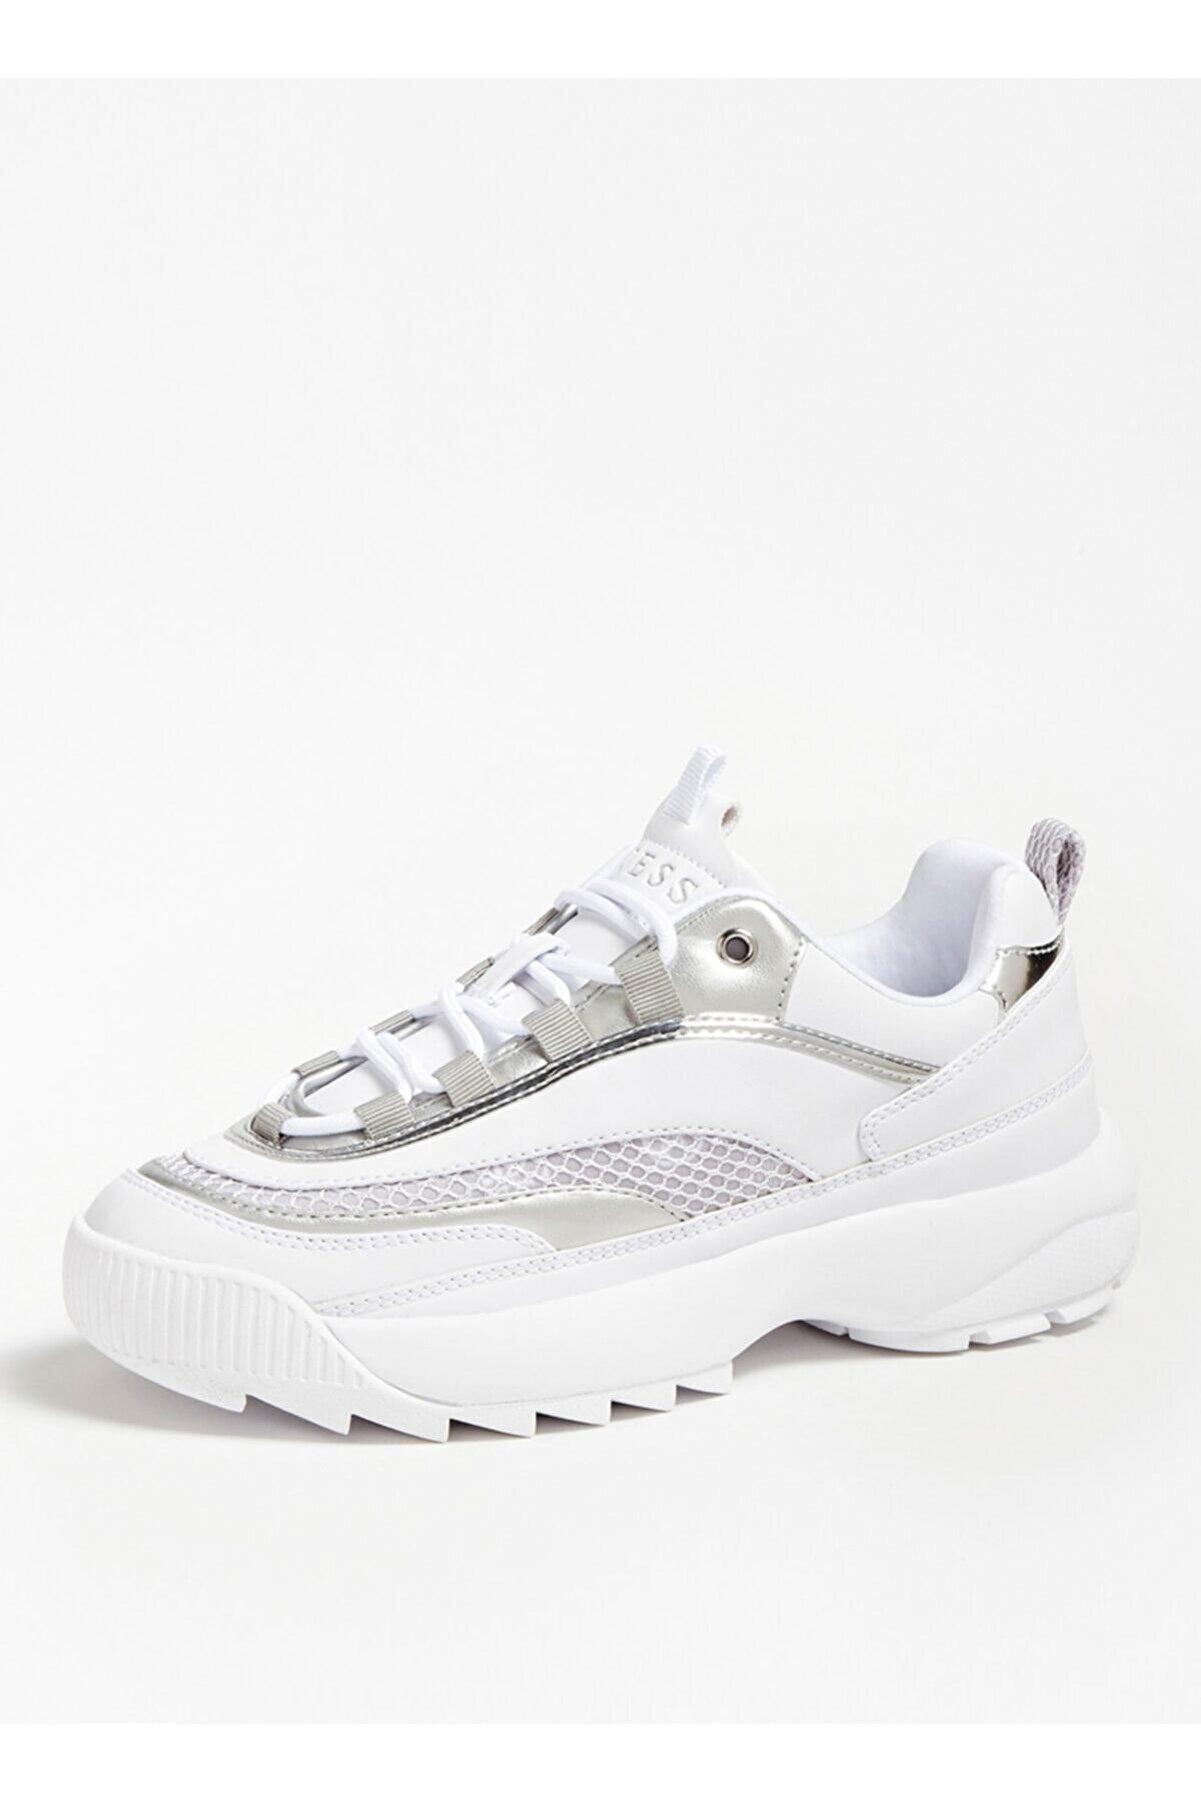 Guess Kadın Beyaz Sneakers